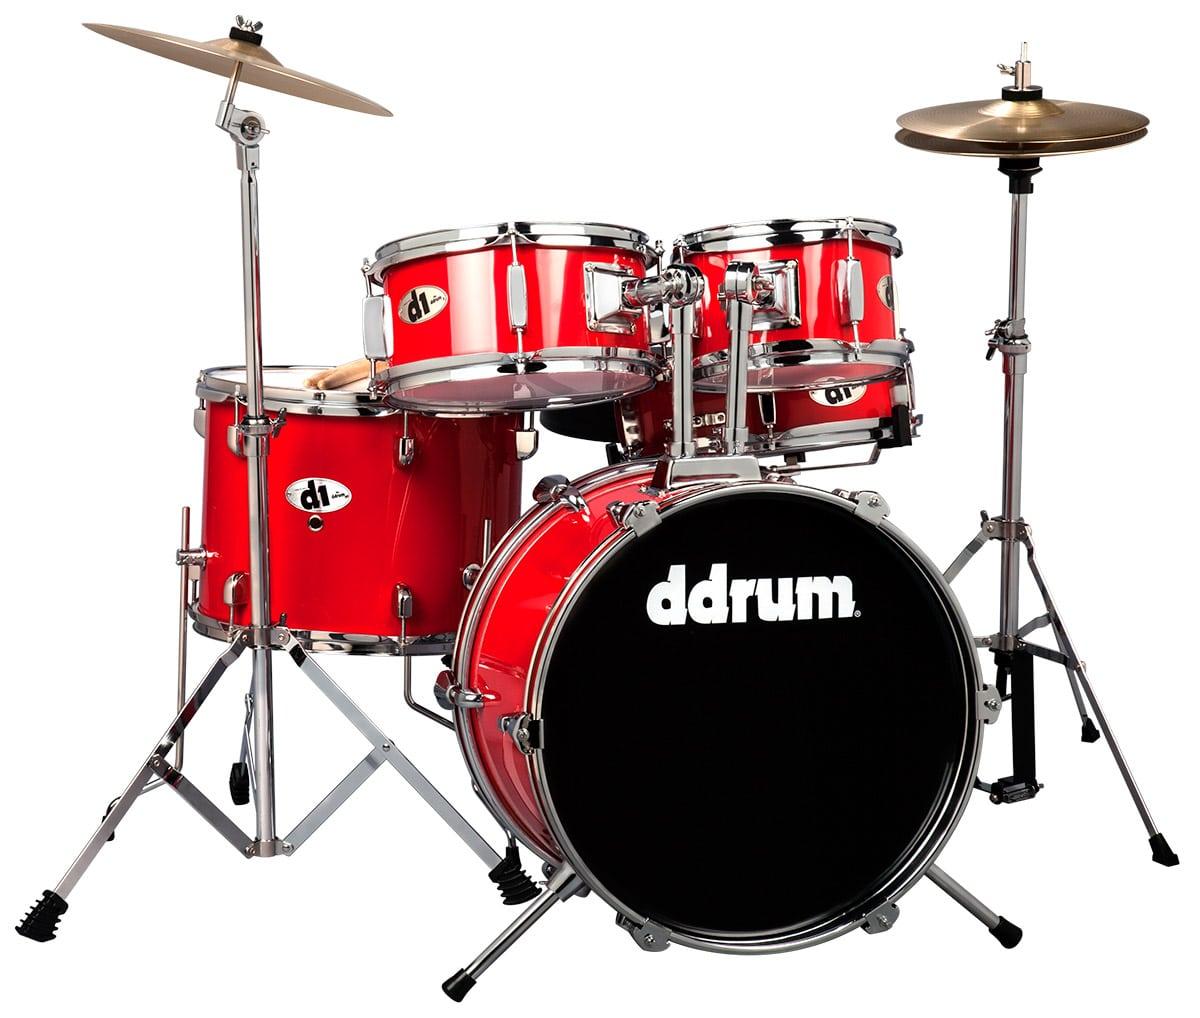 Ddrum D1 Junior Drum Kit W Cymbals Colors Blue Red Black Mega